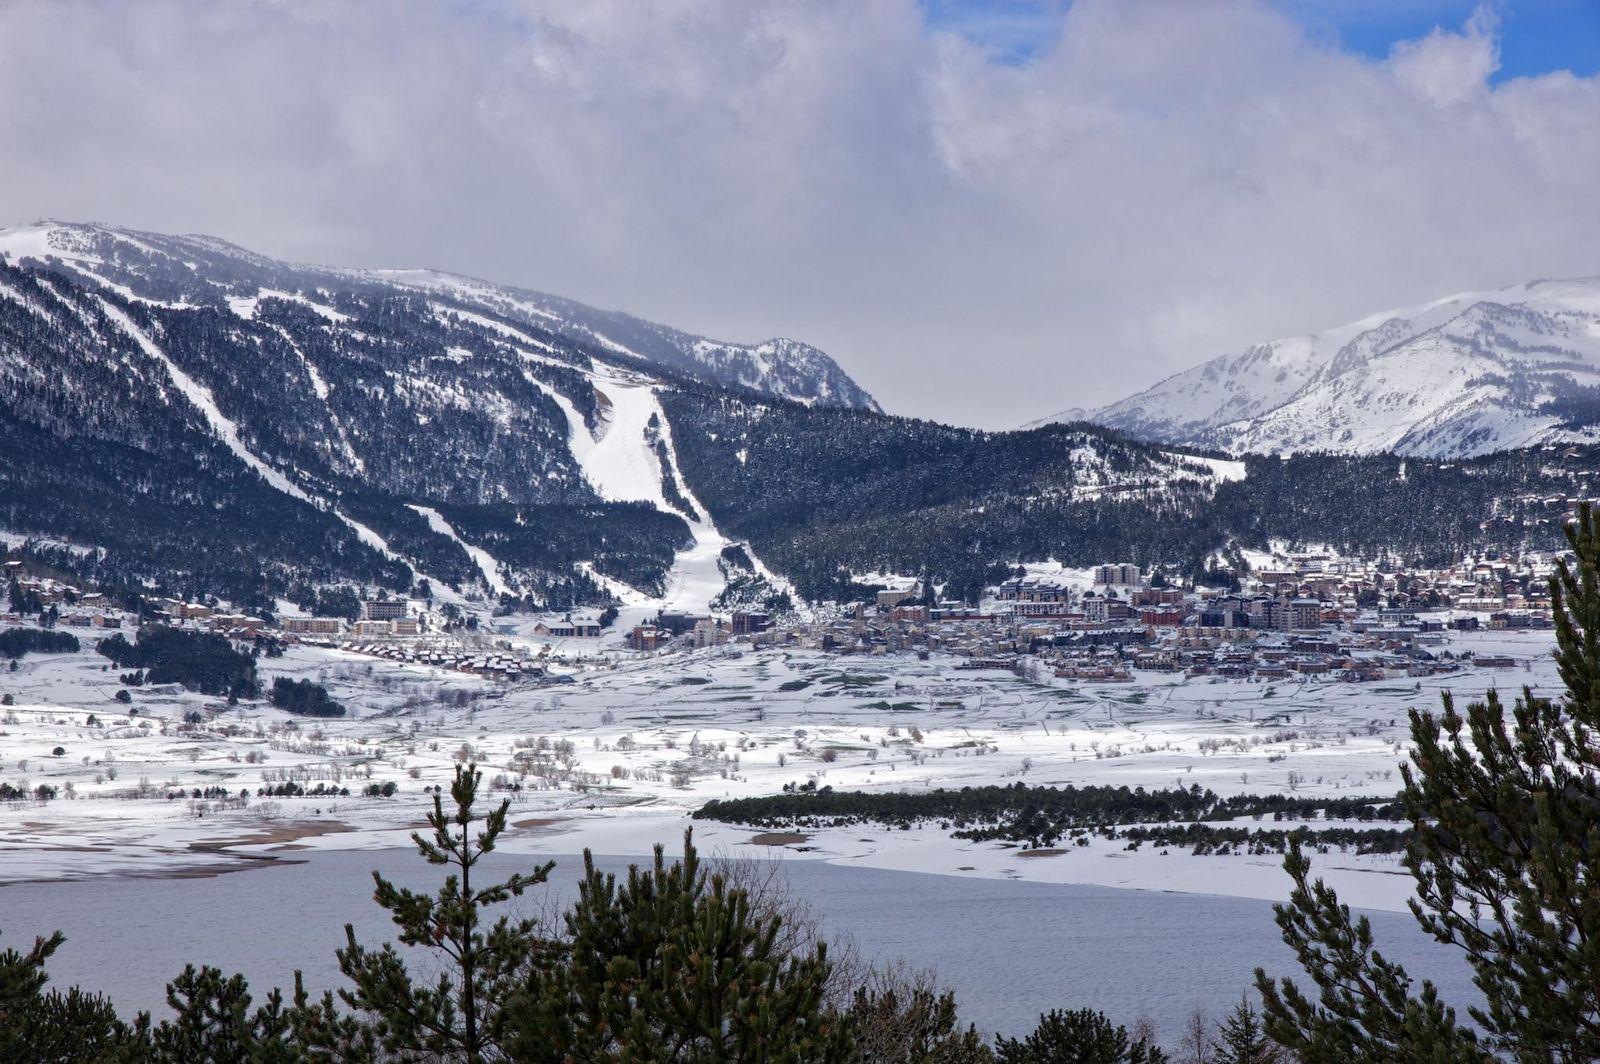 Station de ski des Angles_Les Angles (1)